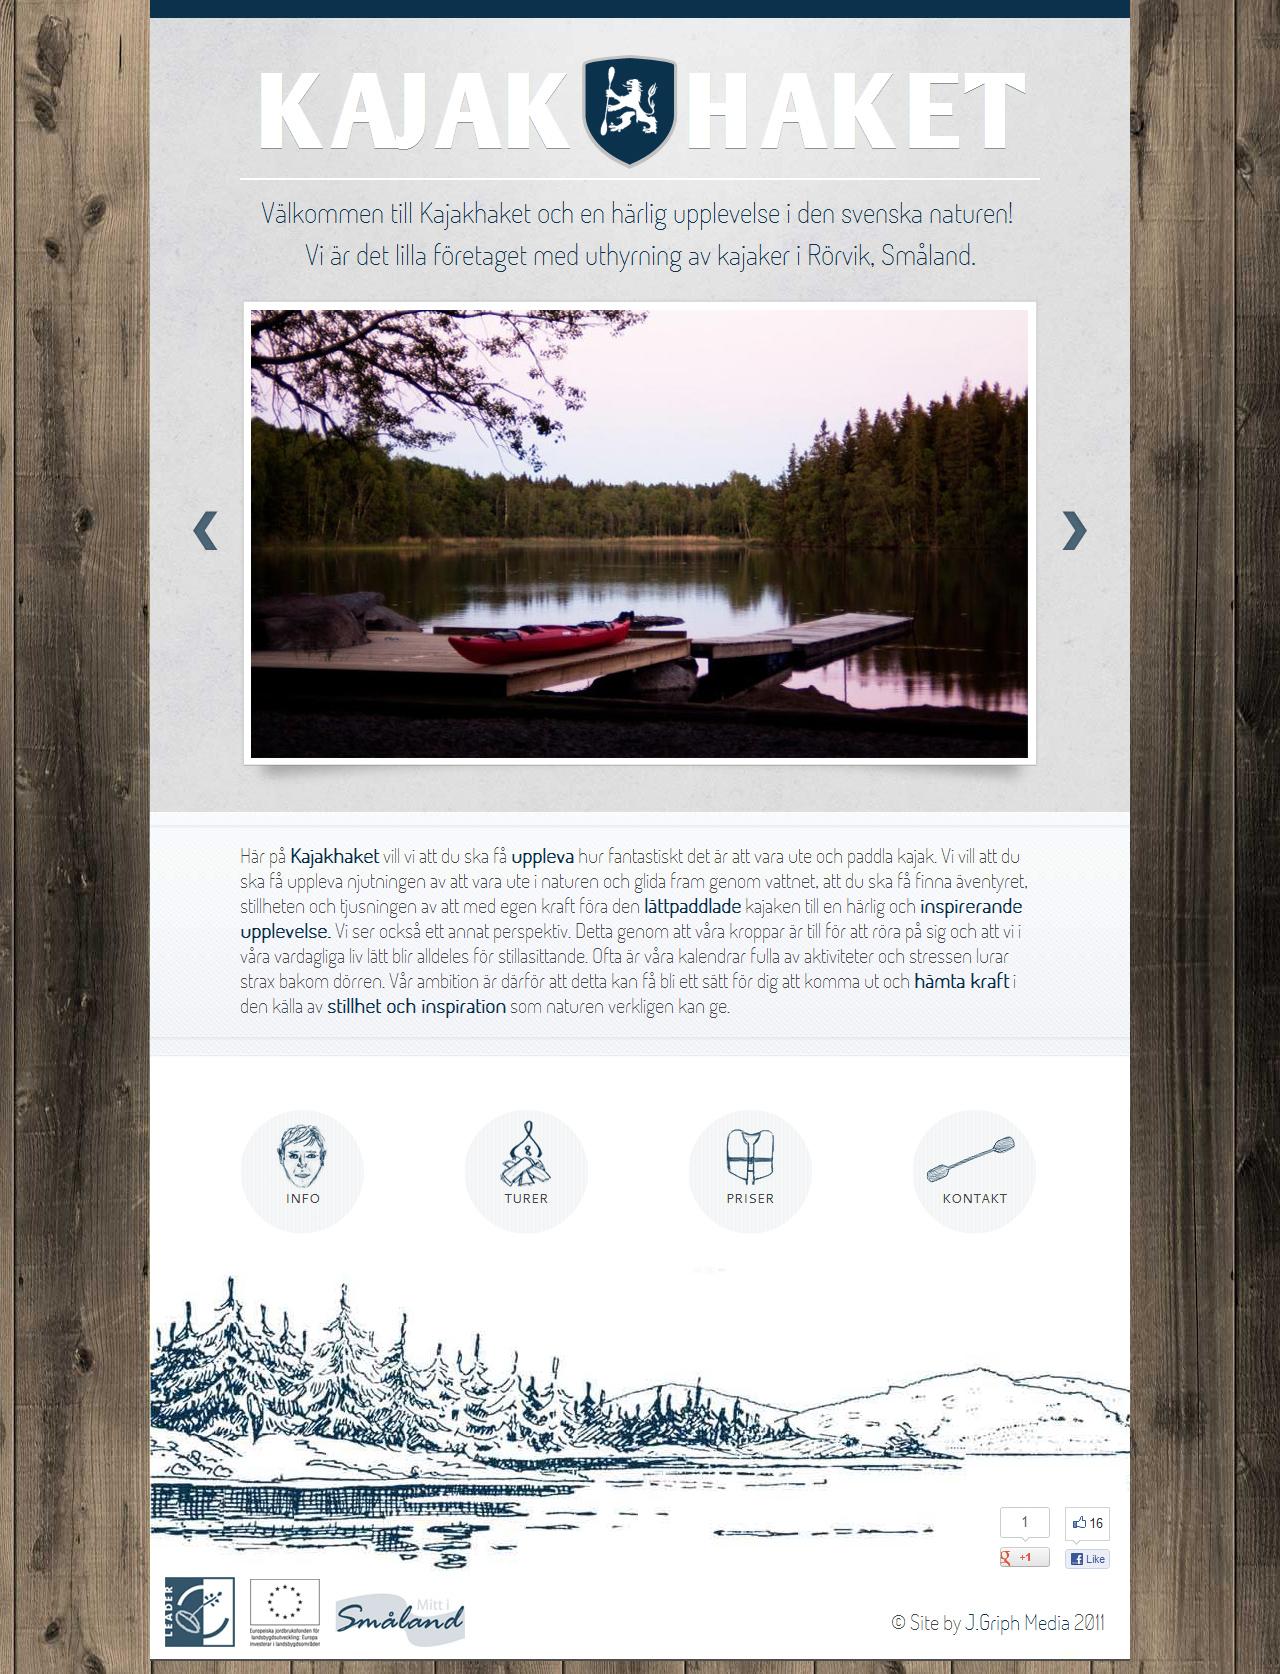 Kajakhaket Website Screenshot